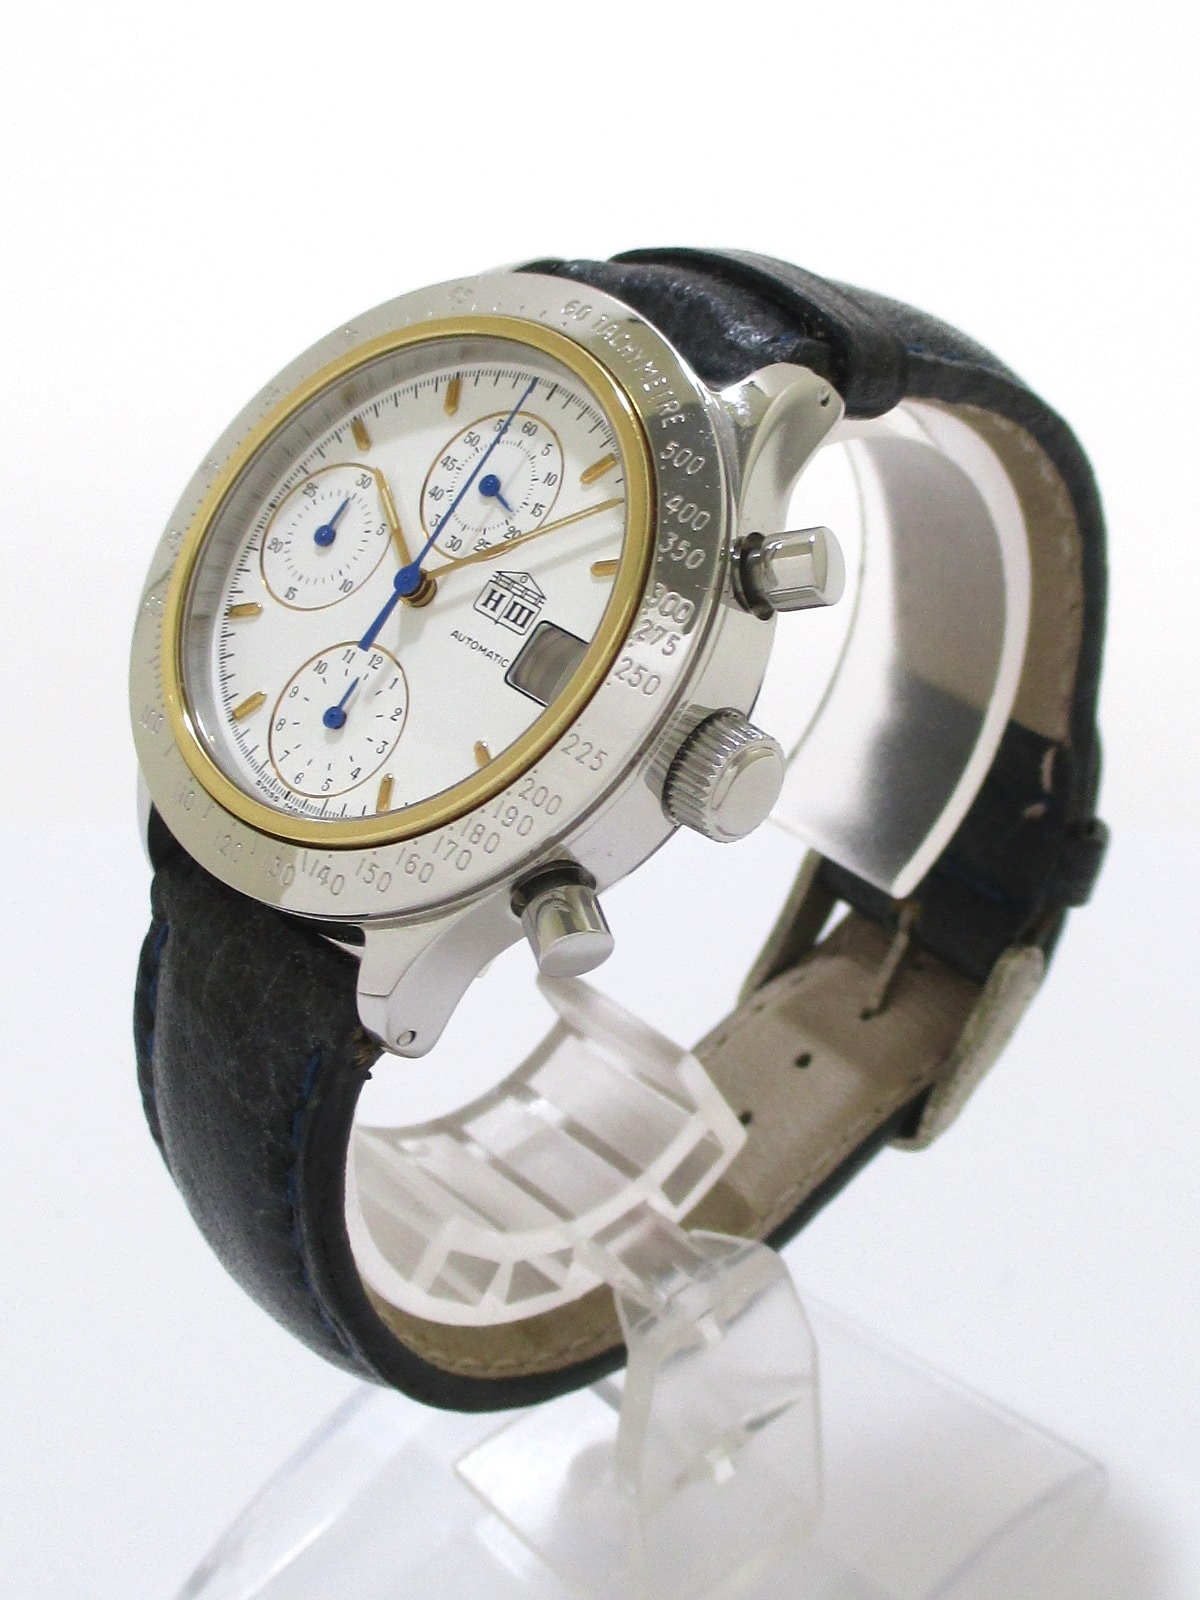 Stefanjohansson(ステファンヨハンソン)の腕時計